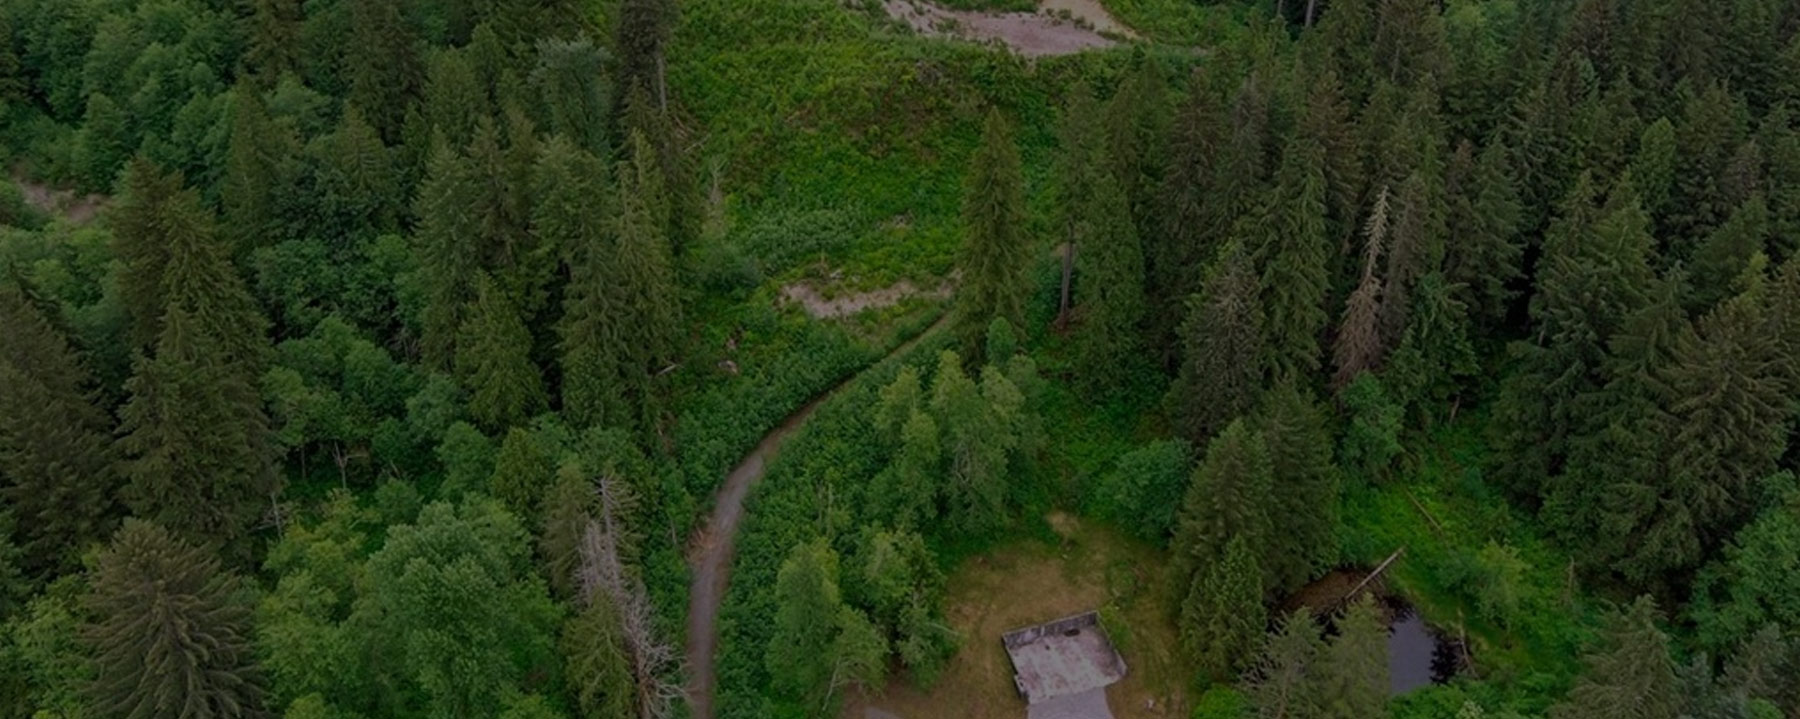 Land properties from Nesco realty